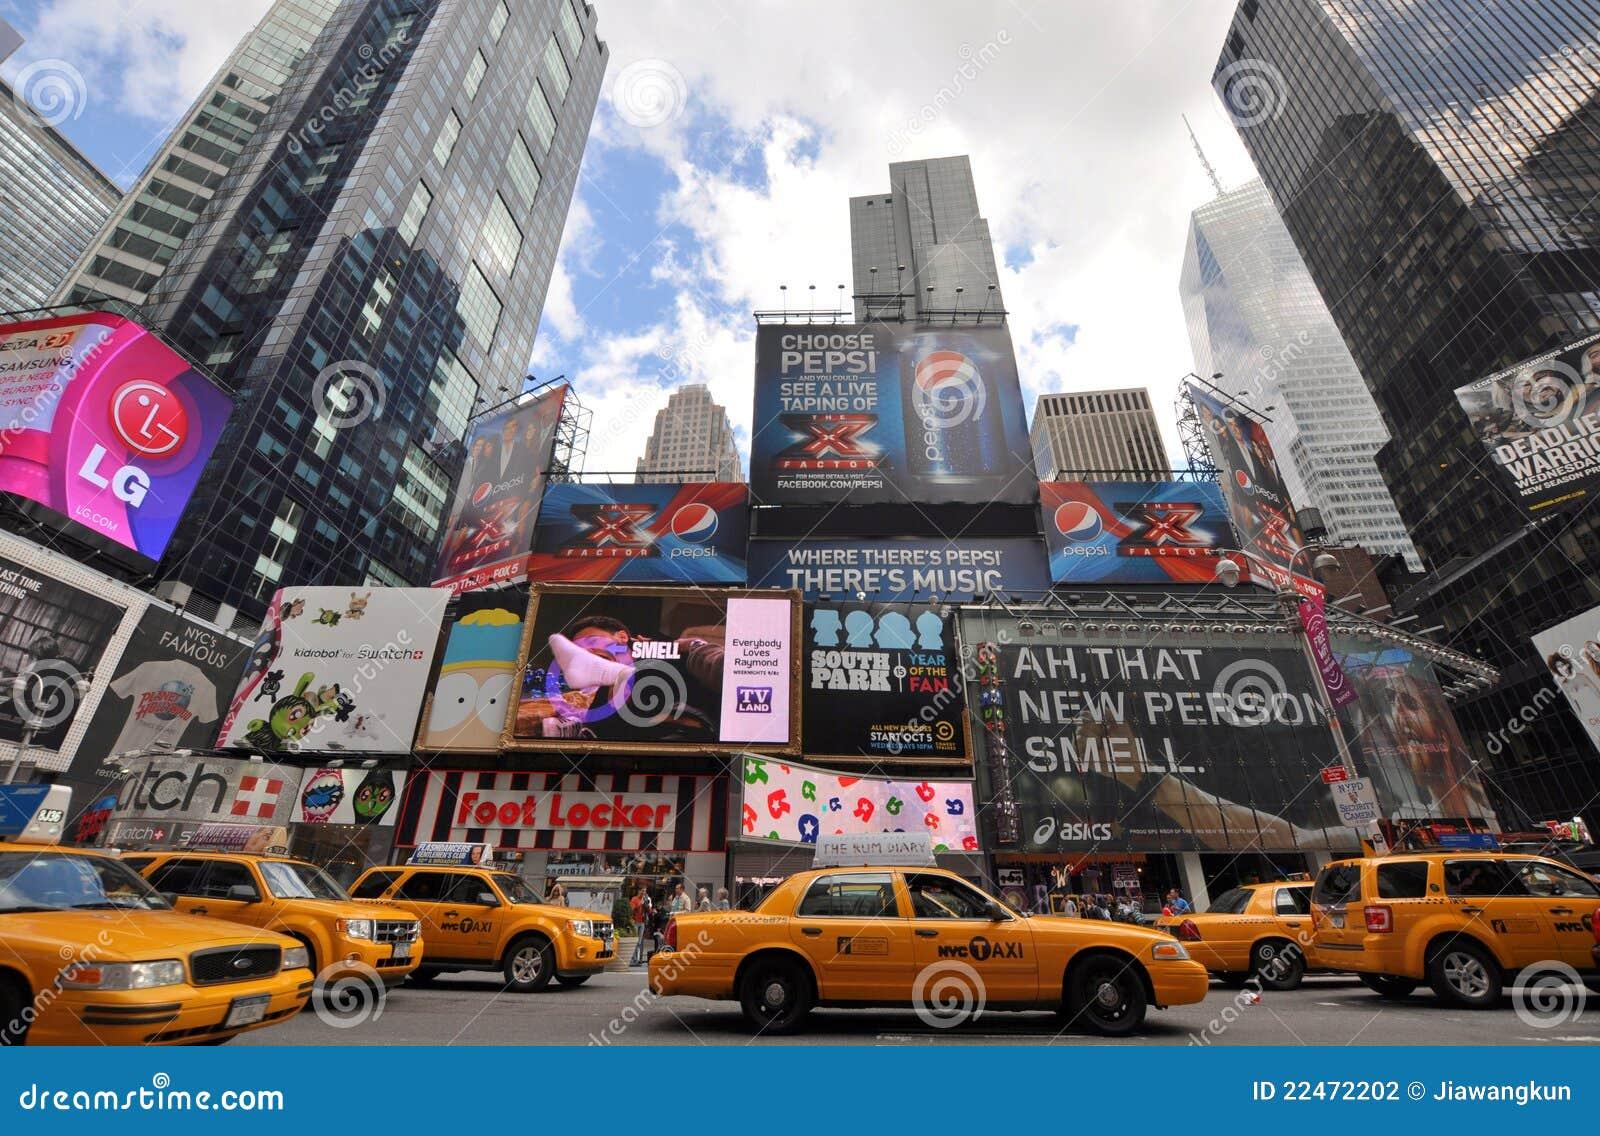 taxi jaune dans le times square new york city photographie ditorial image 22472202. Black Bedroom Furniture Sets. Home Design Ideas